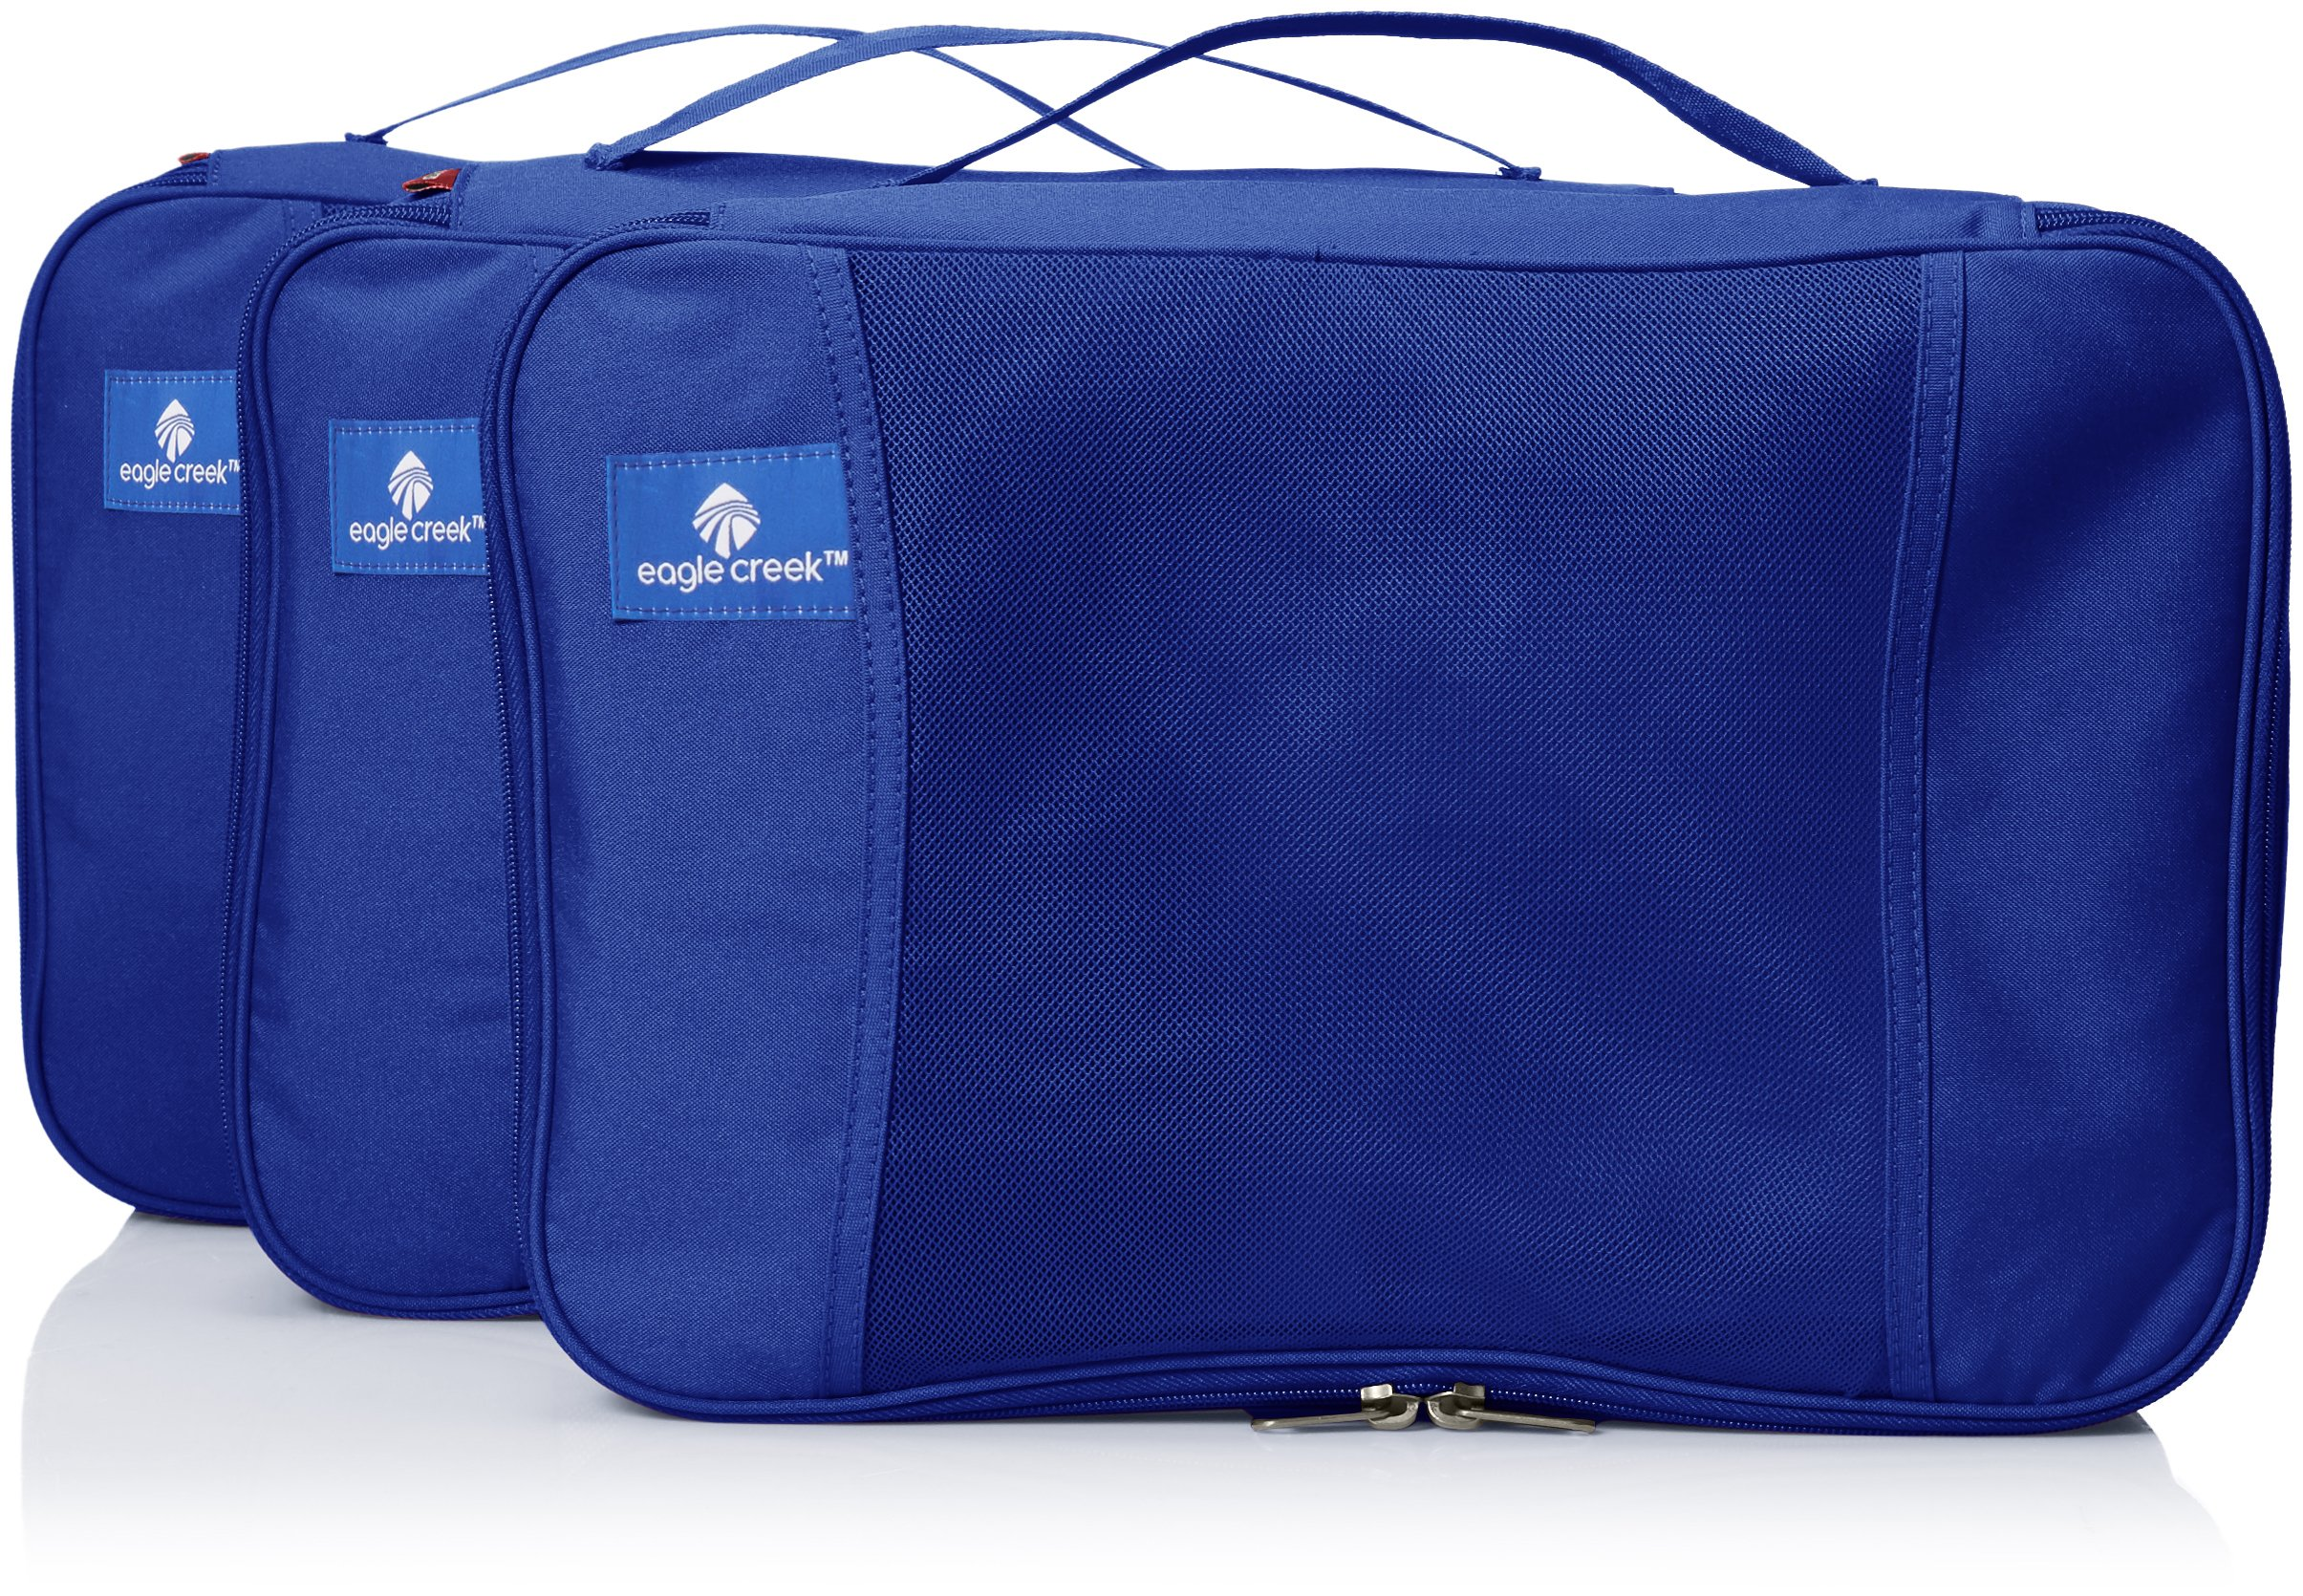 Eagle Creek Pack-It Full Cube Packing Set, Blue Sea, Set of 3 by Eagle Creek